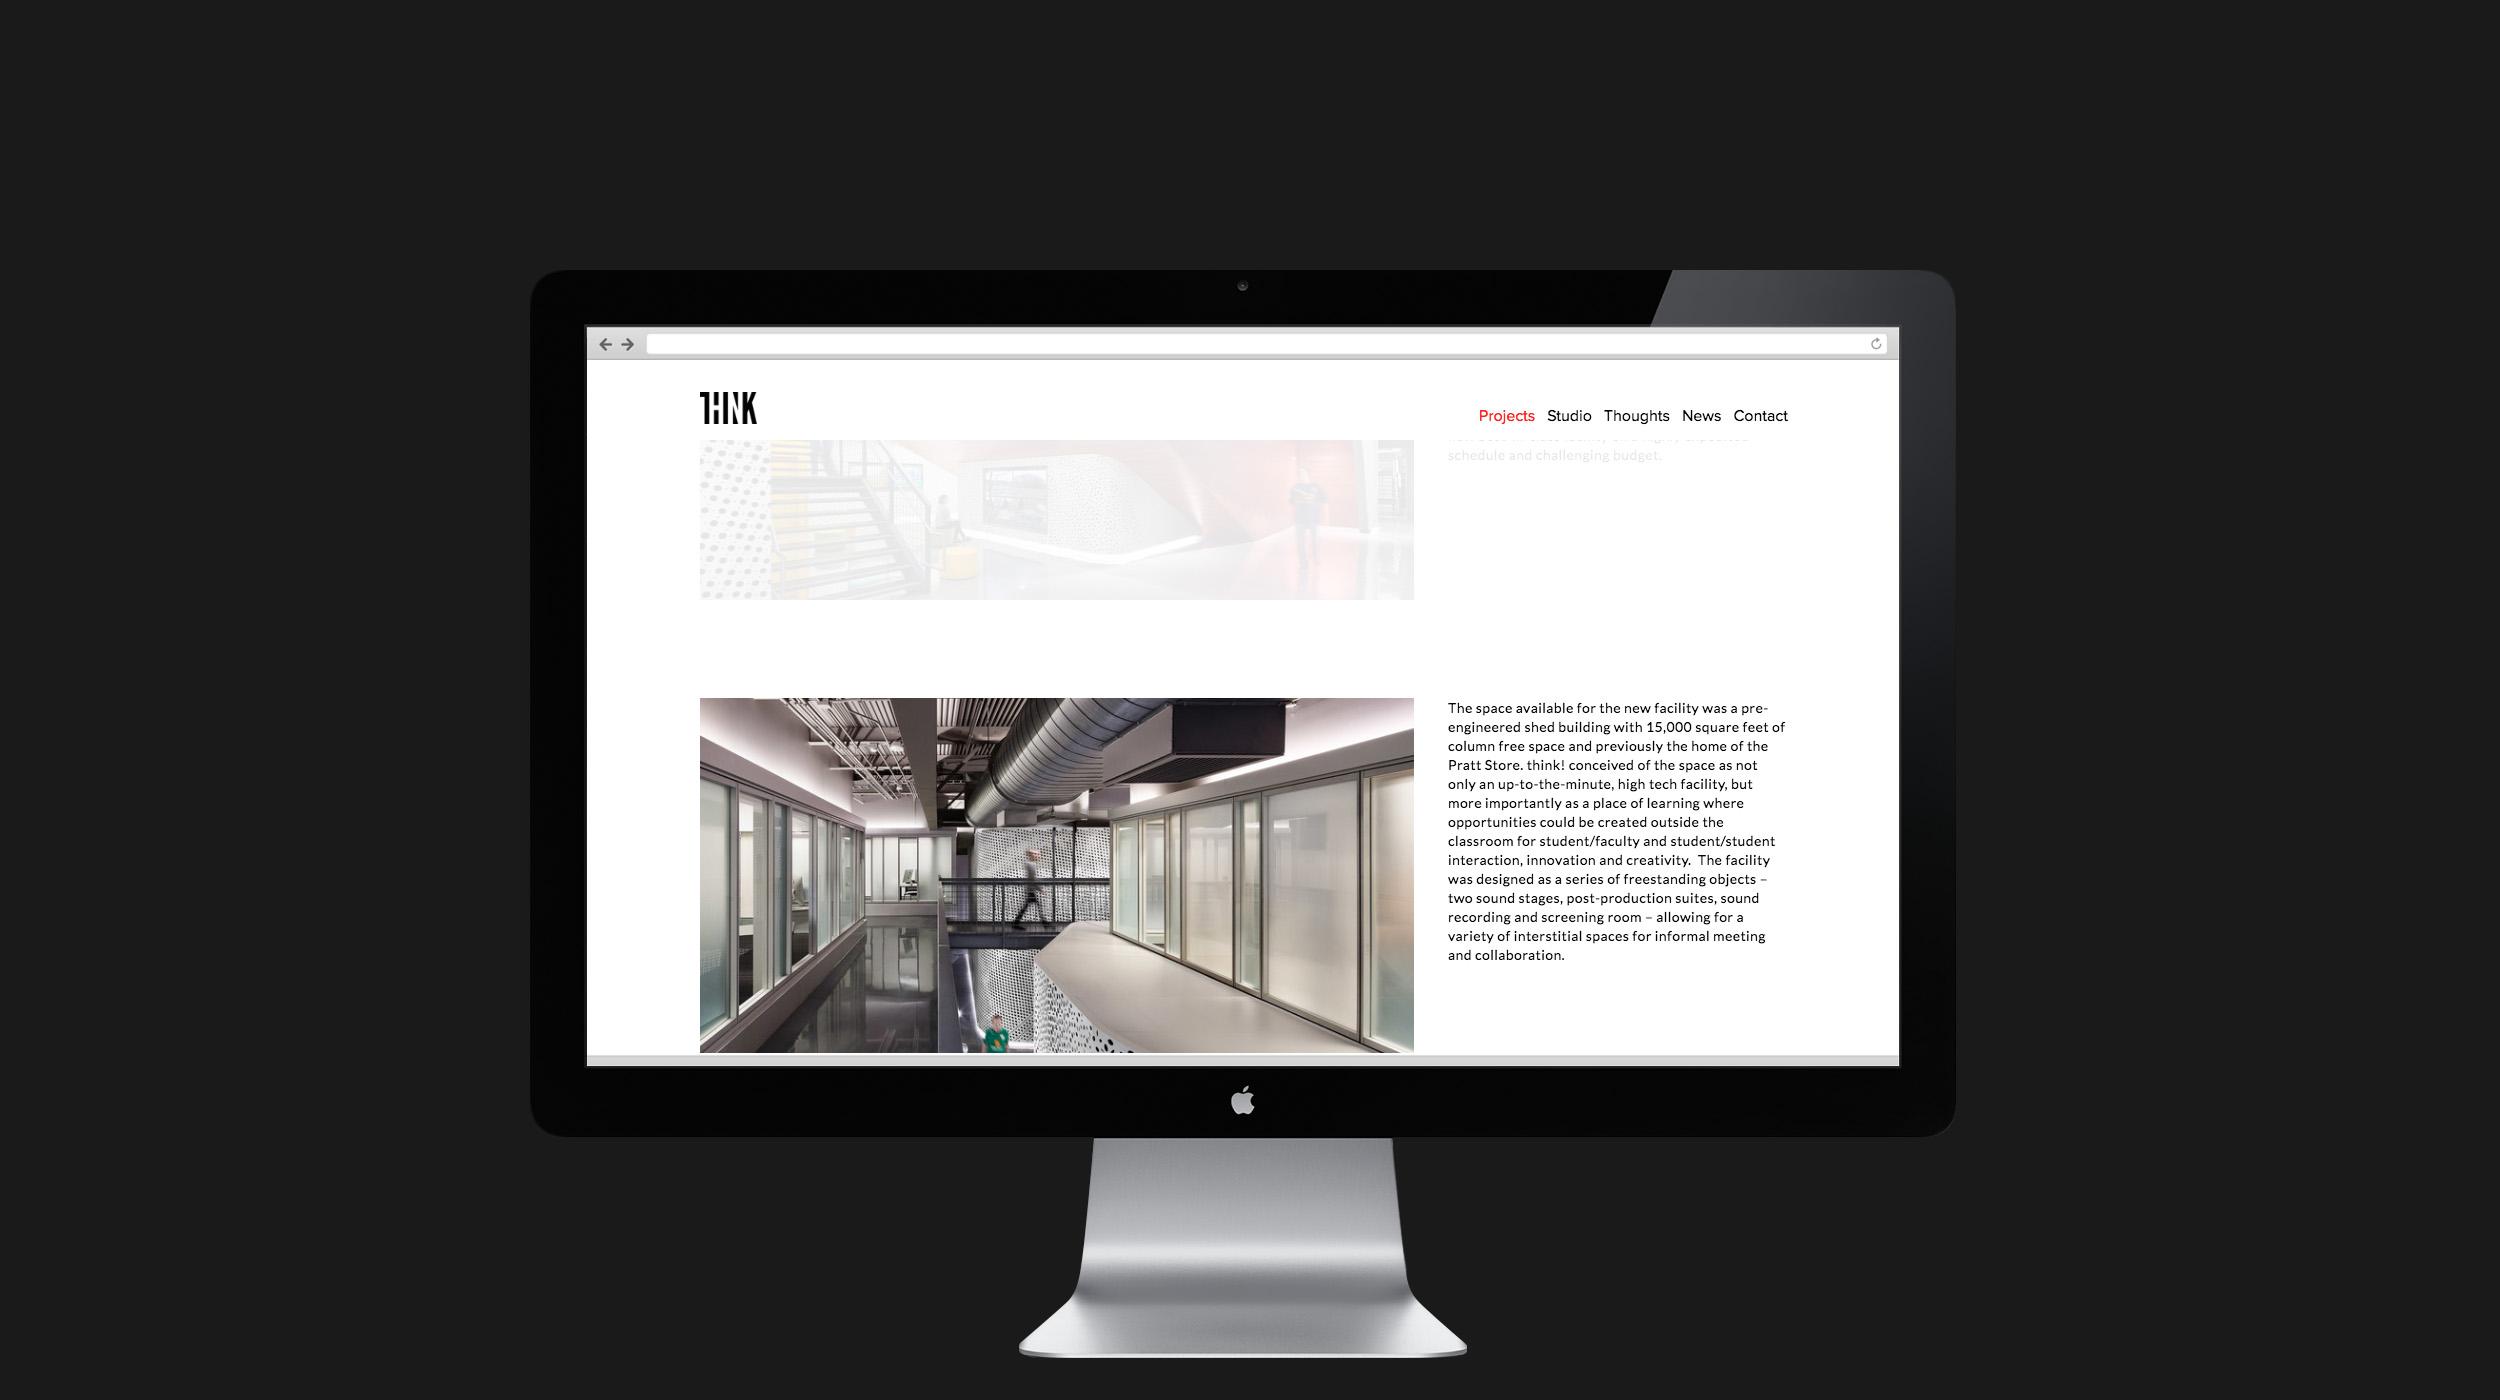 Think! web design, case study